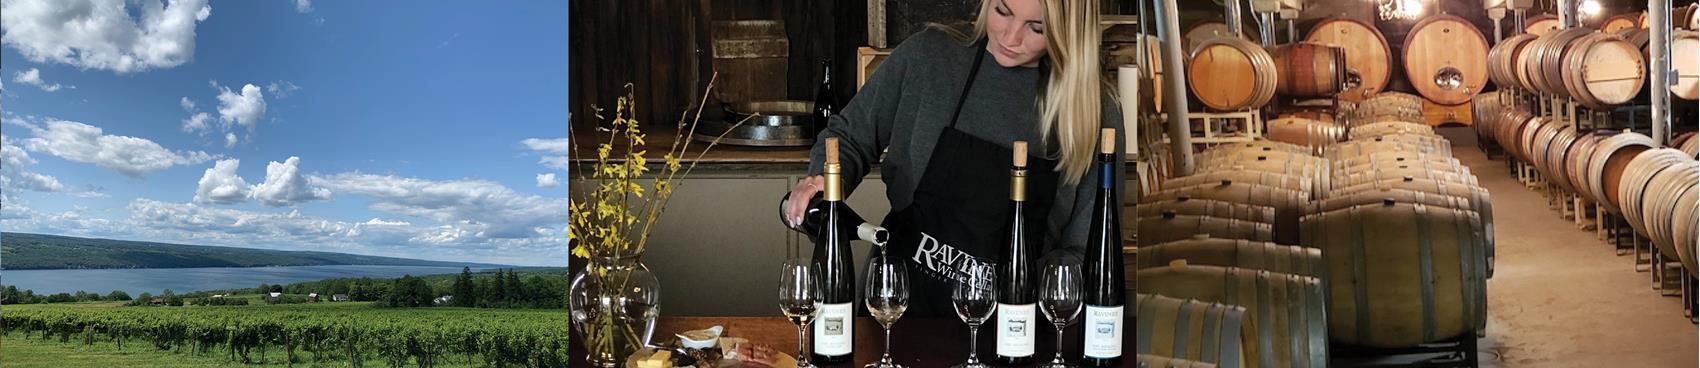 A image of Ravines Wine Cellars